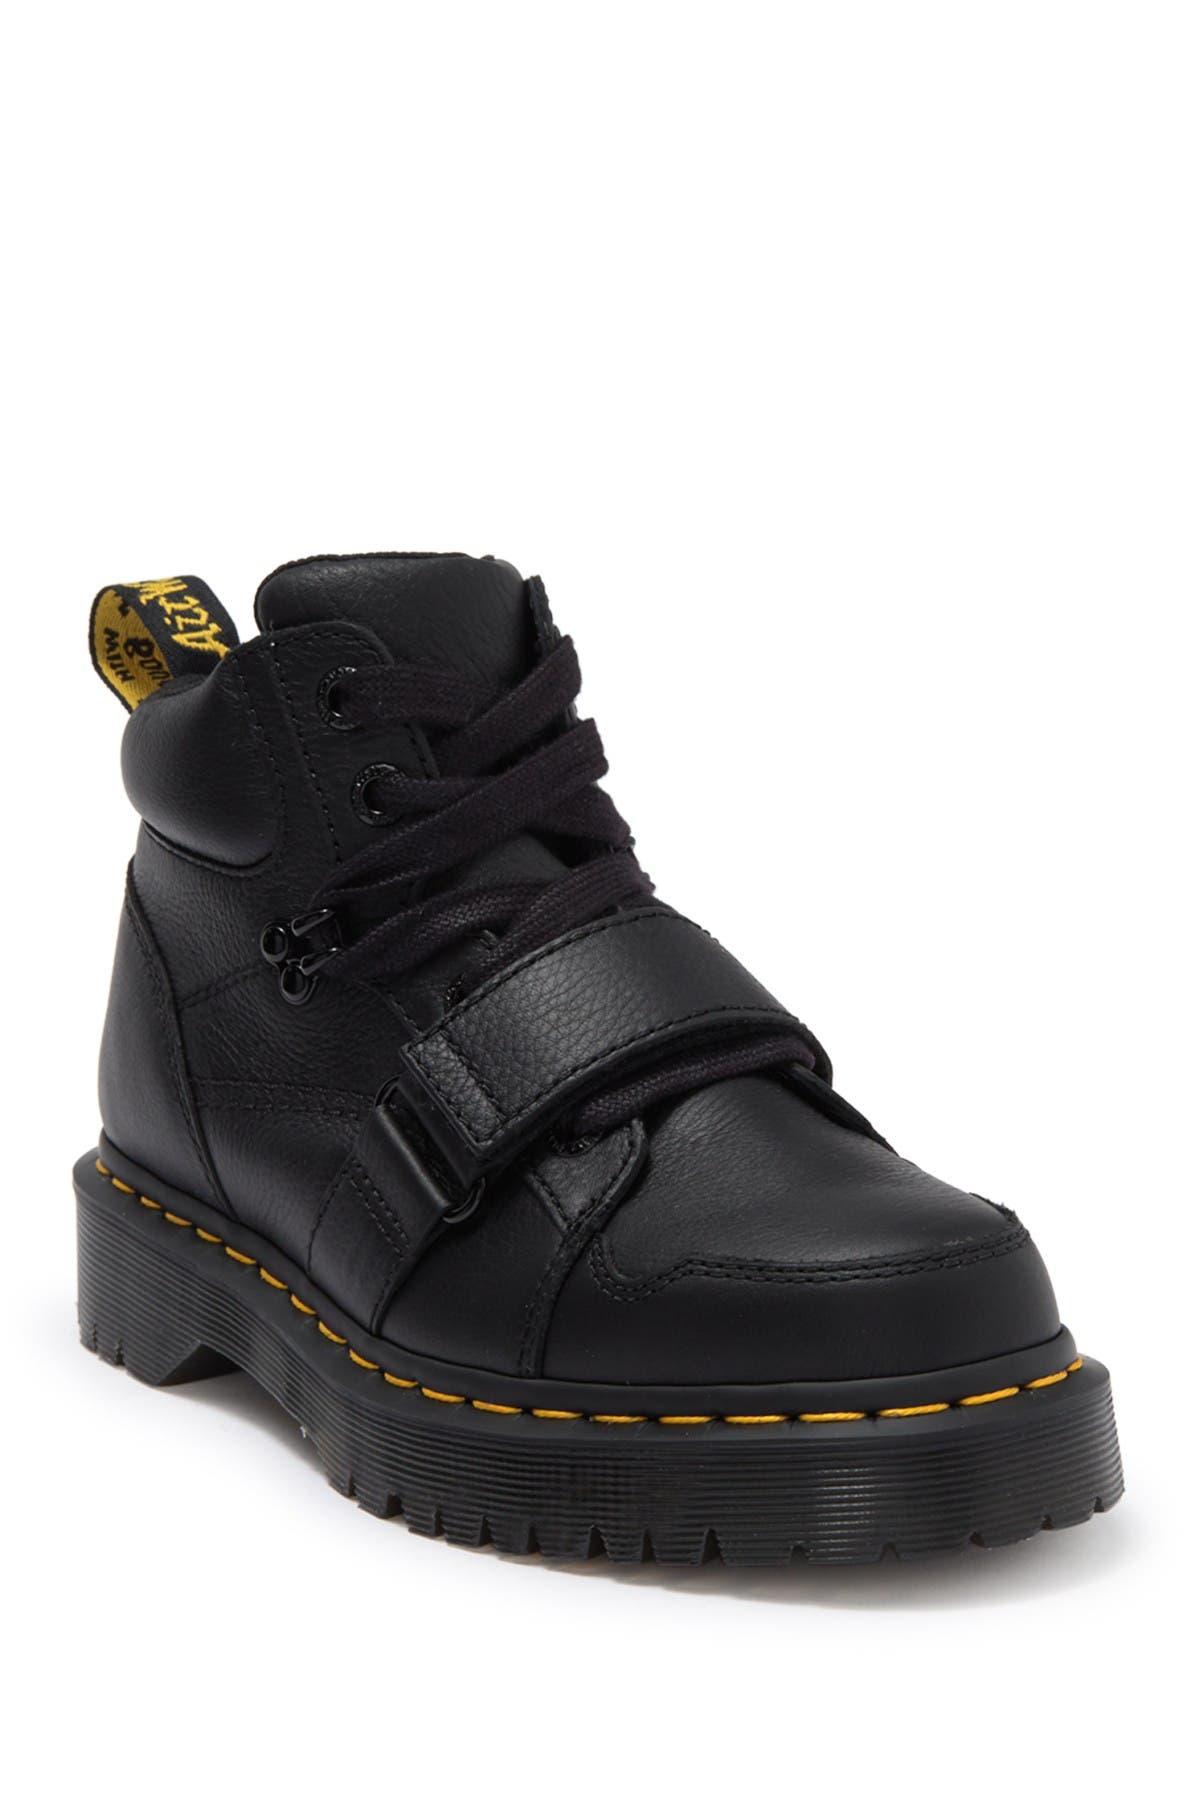 Image of Dr. Martens Zuma II Boot